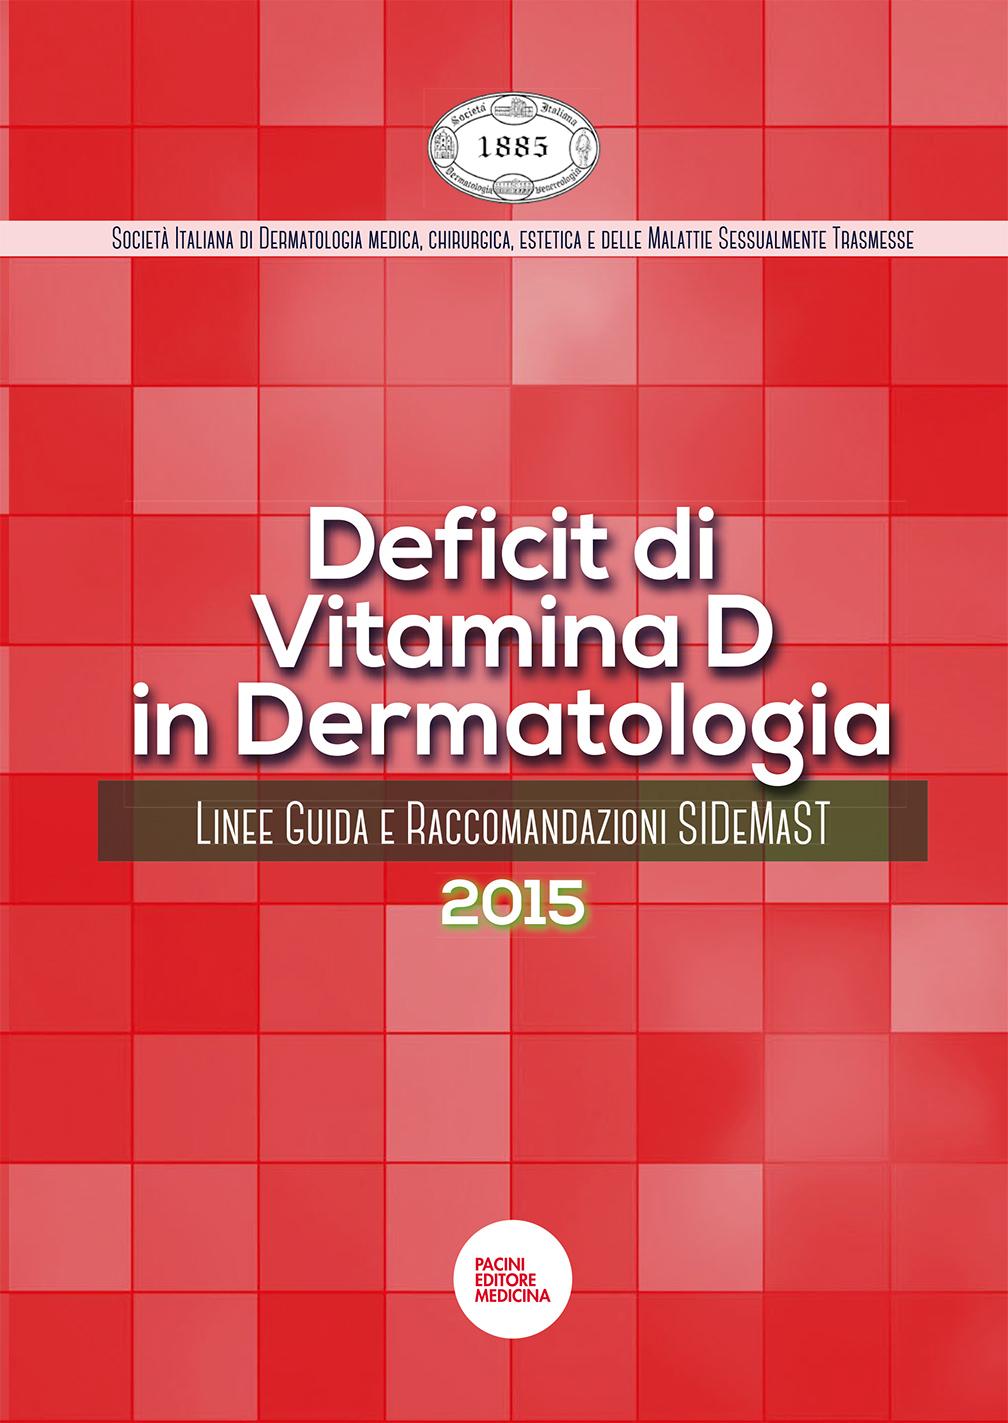 Linee Guida sul deficit di Vitamina D in dermatologia